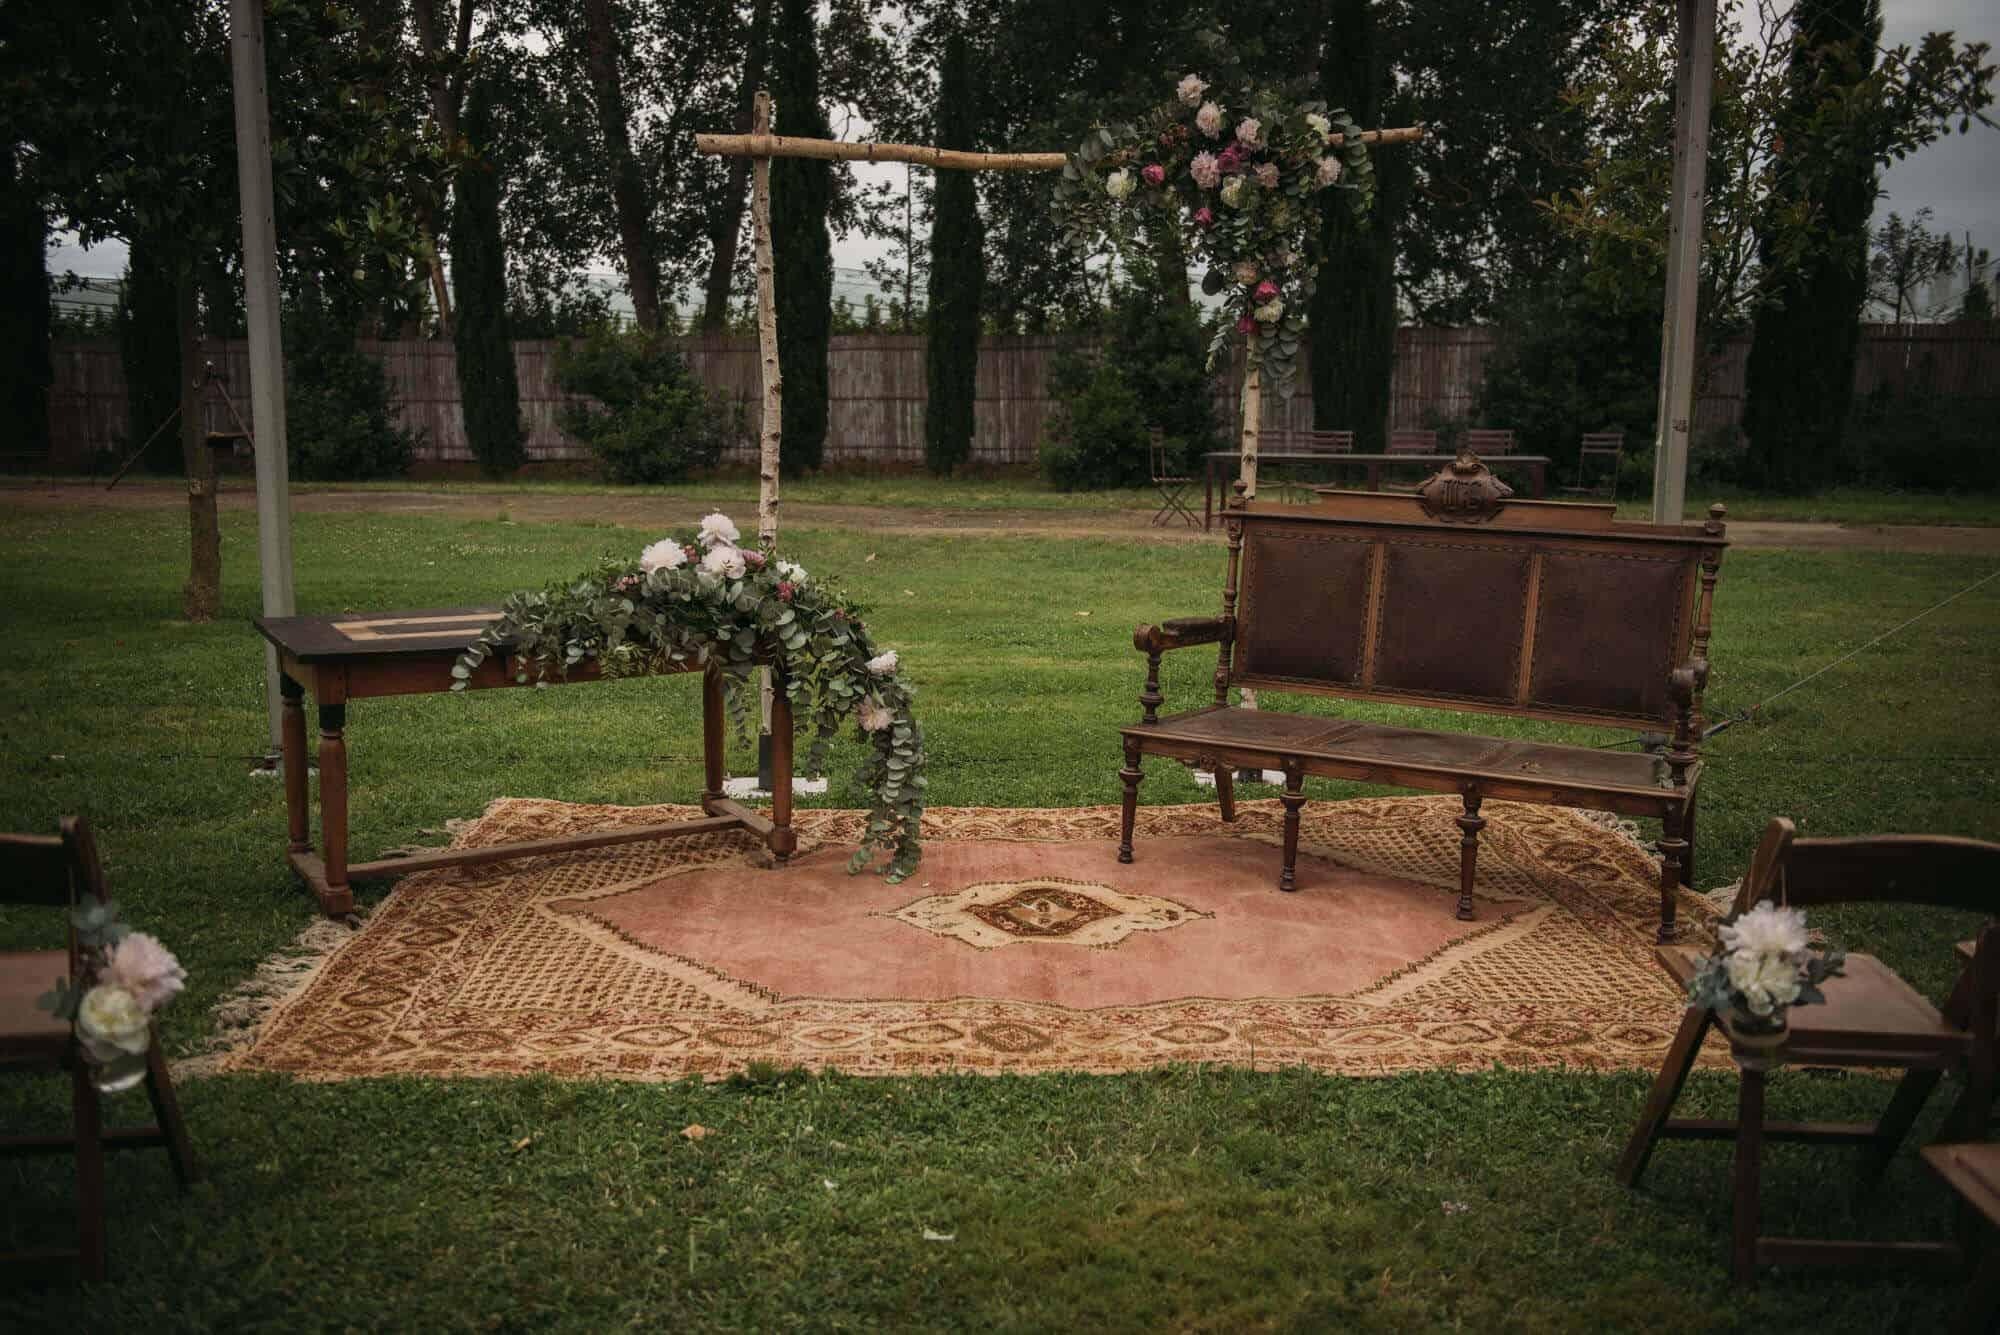 gran tall tallat casament jardí decoració